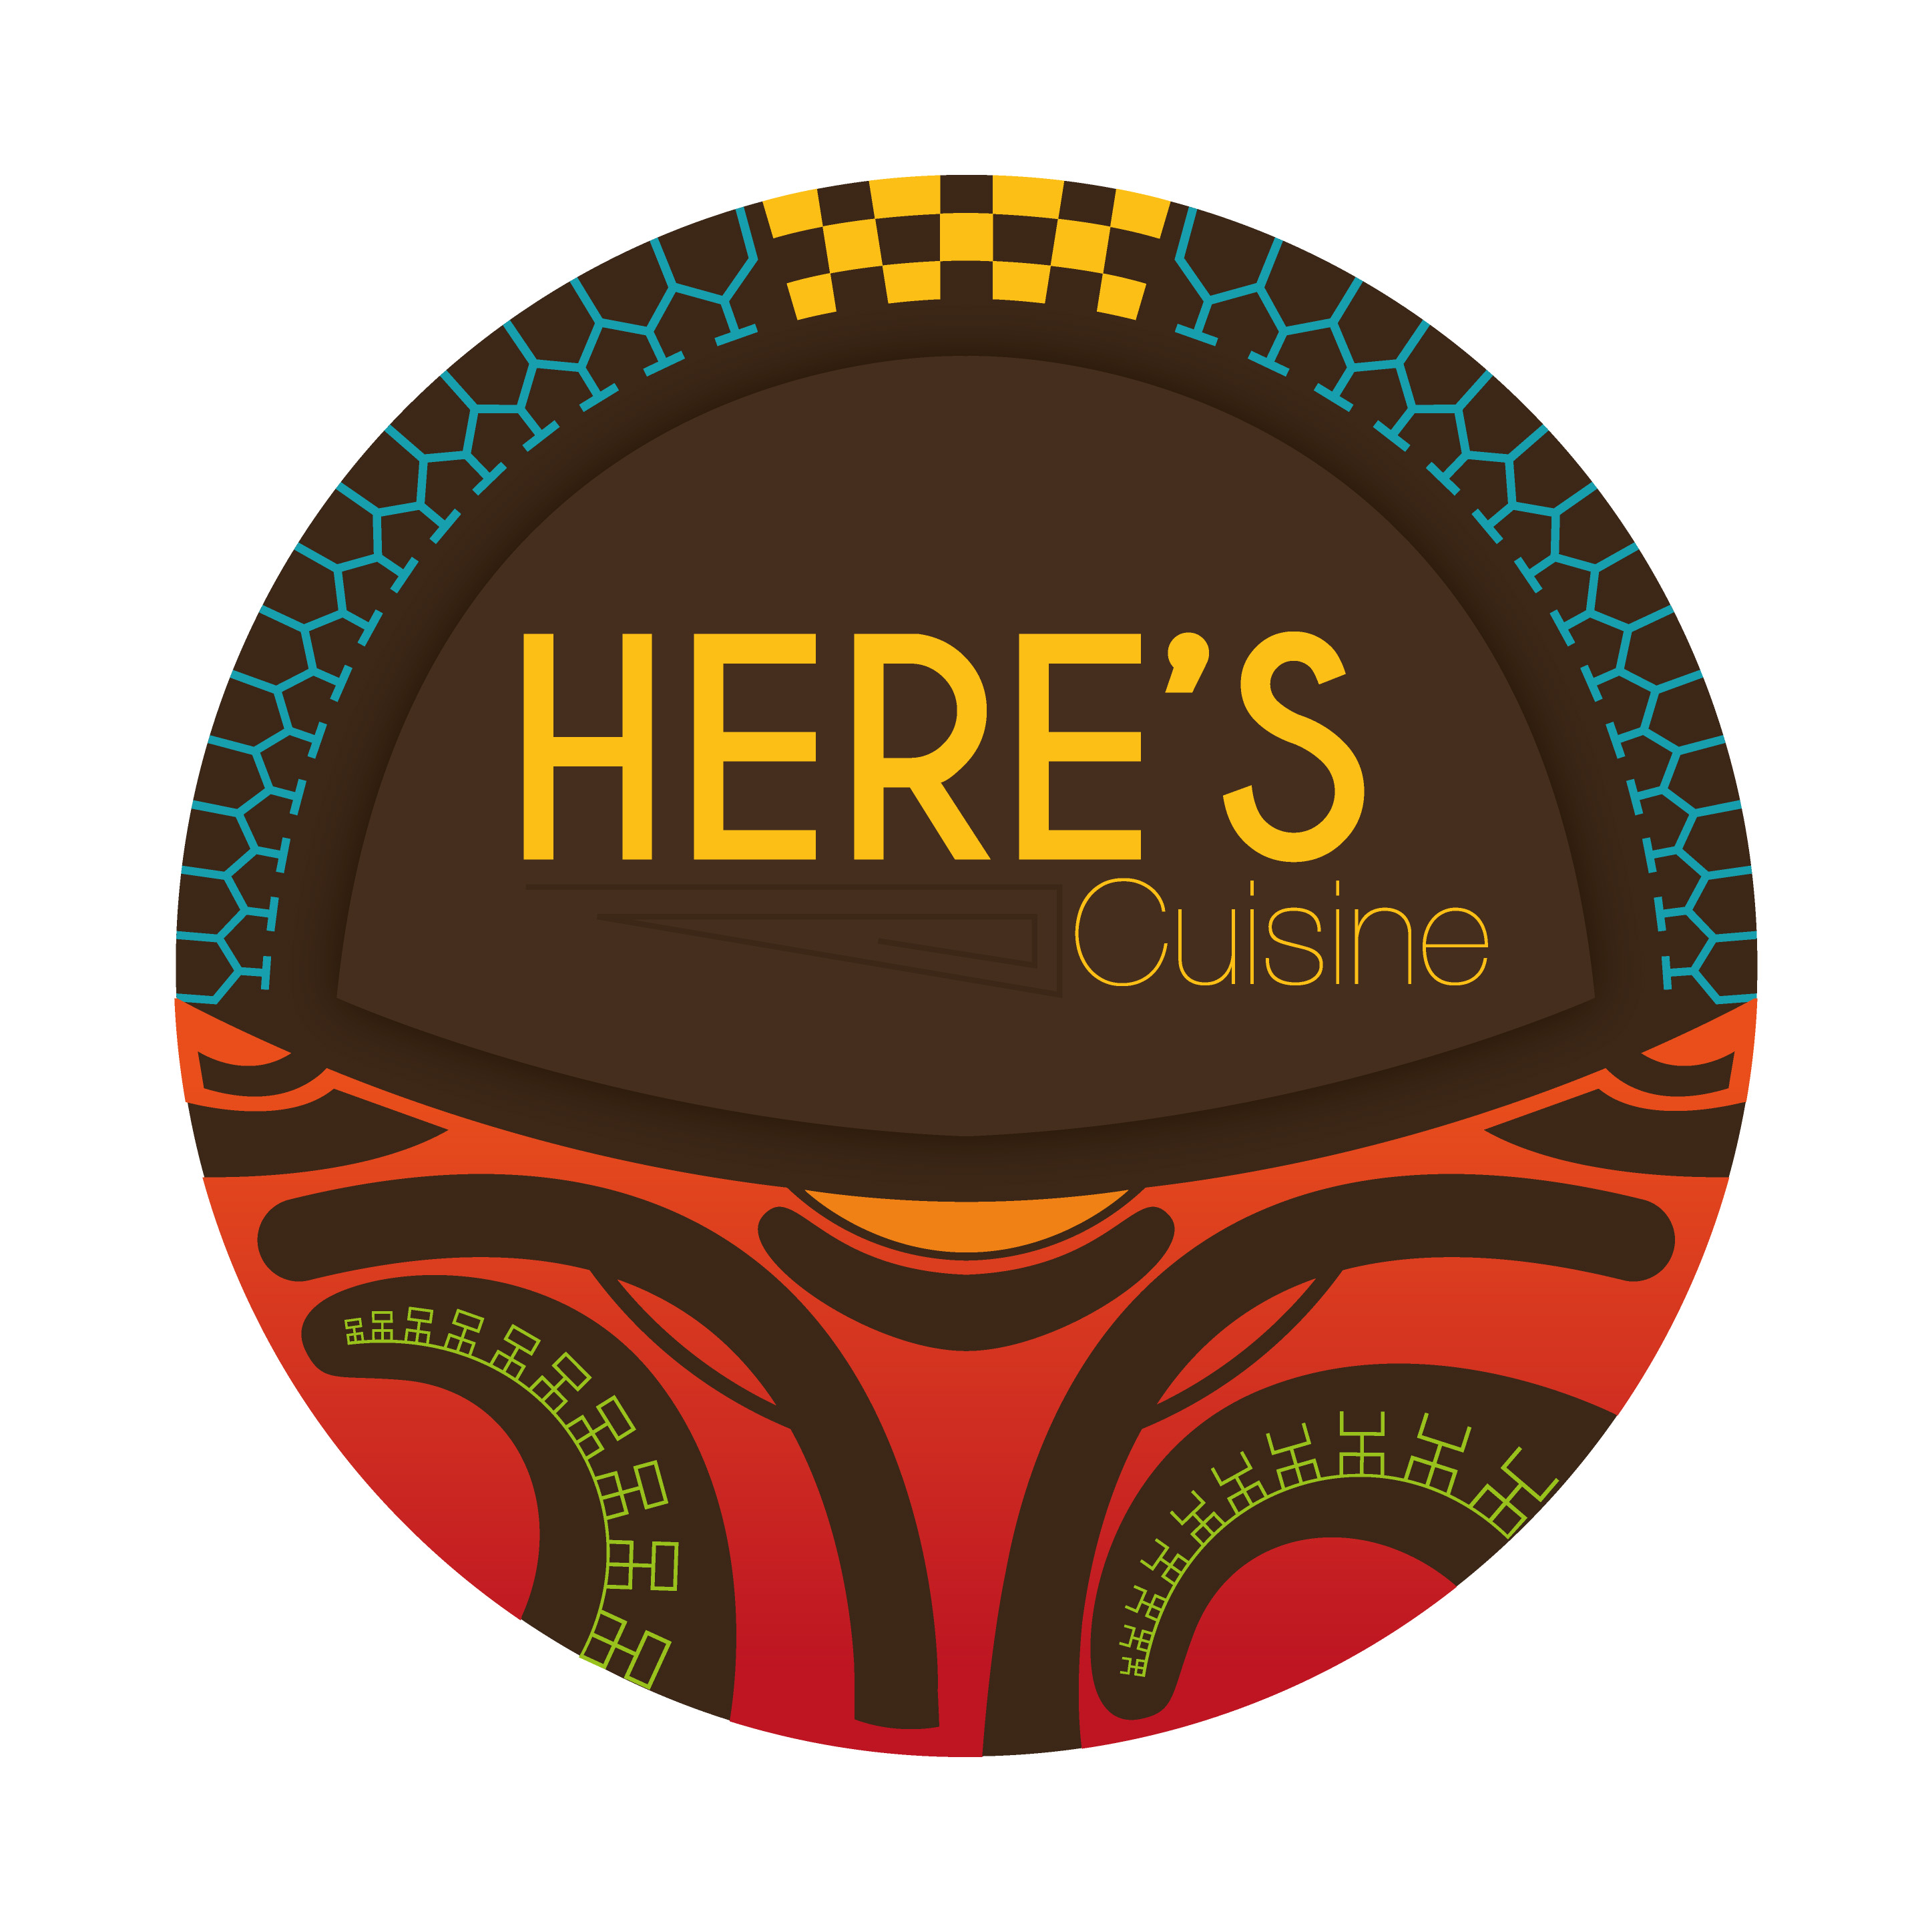 herenui liu logo here's cuisine